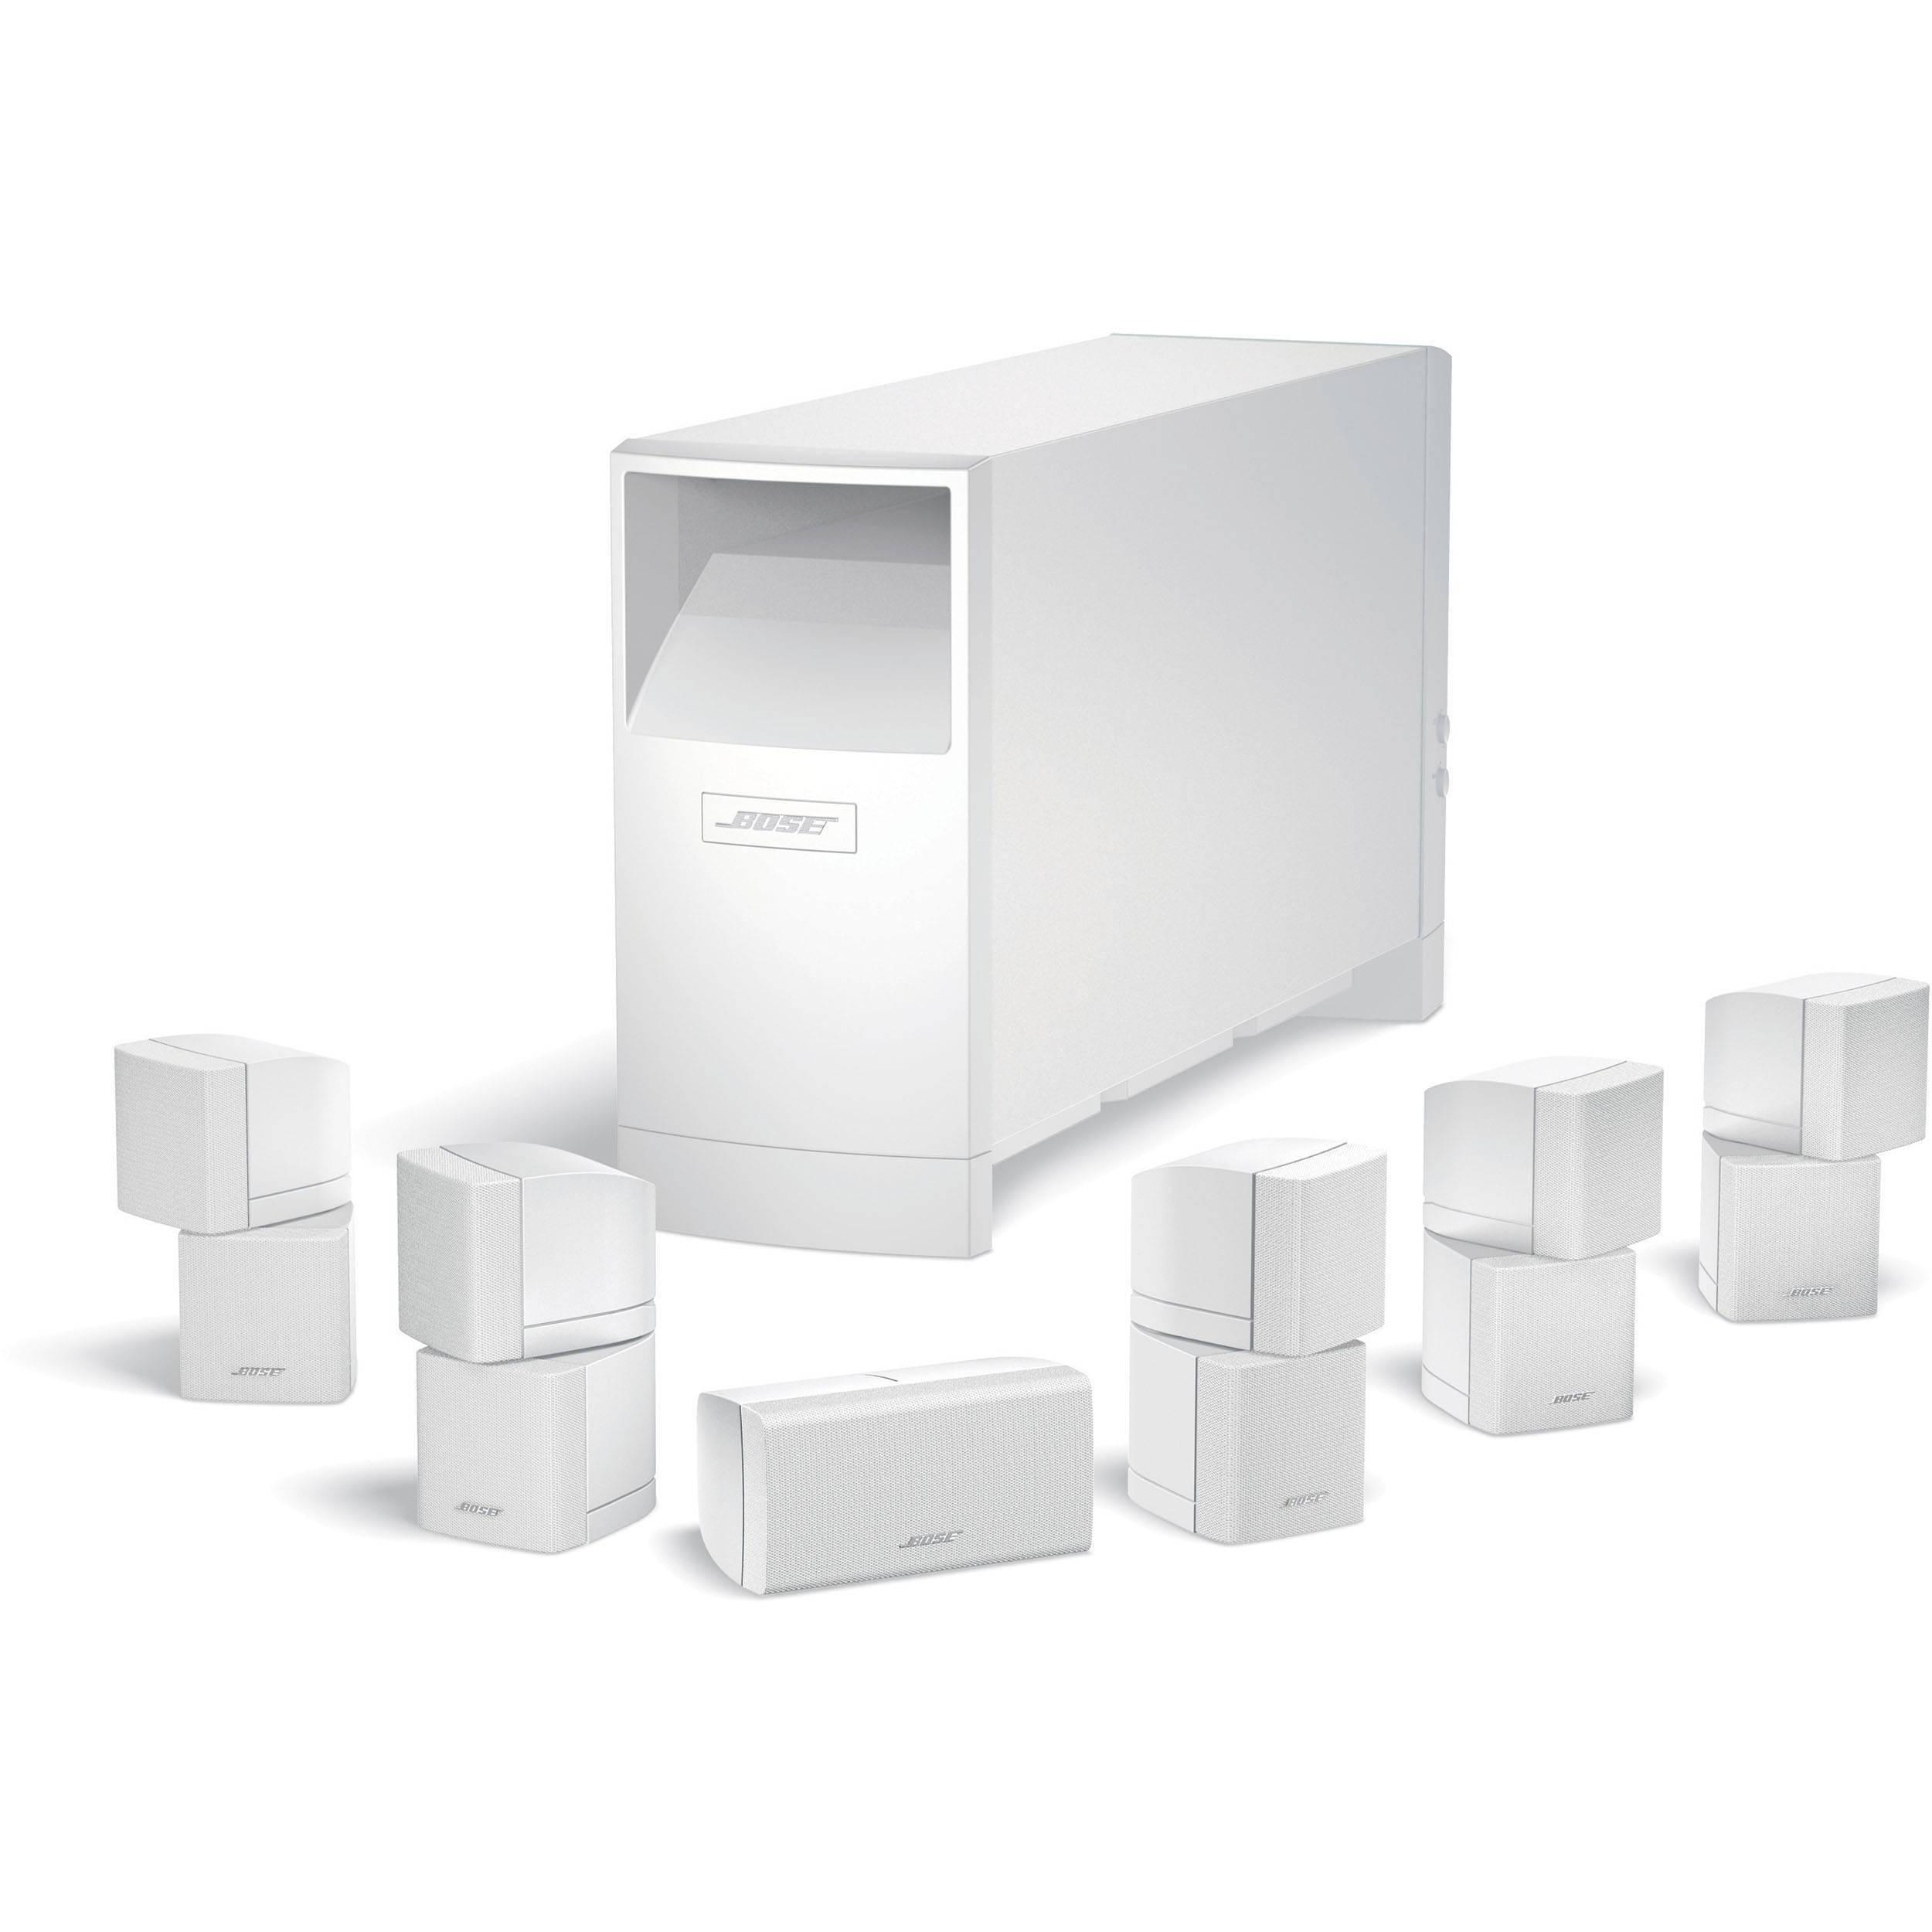 bose acoustimass 16 series ii home entertainment speaker 40367. Black Bedroom Furniture Sets. Home Design Ideas